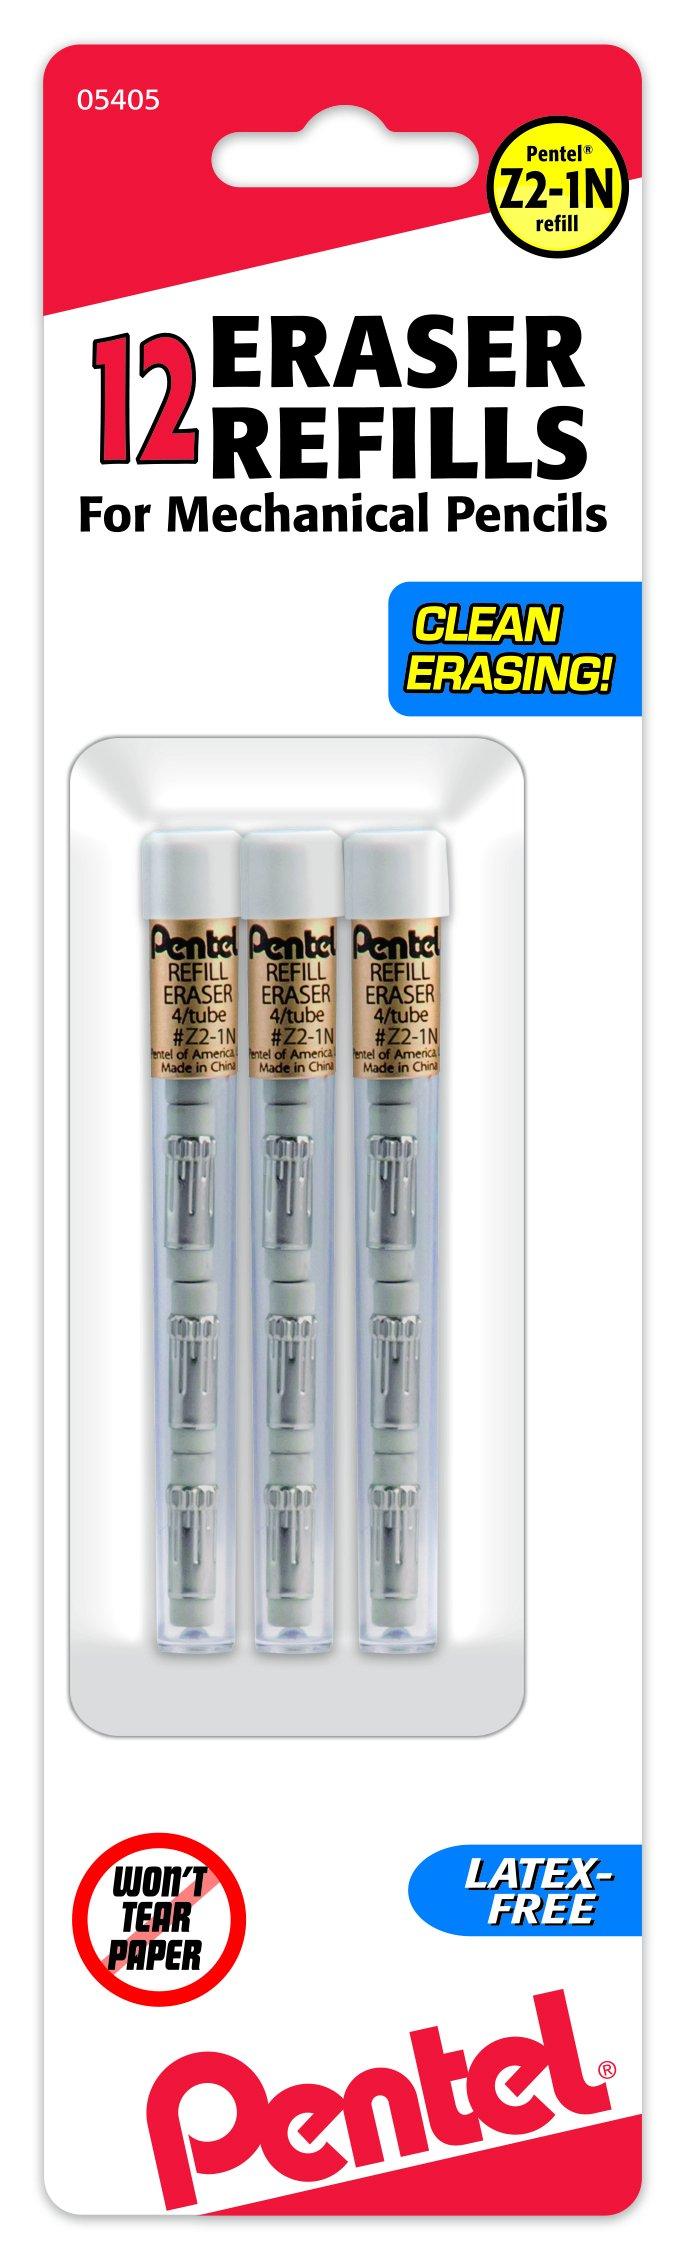 Pentel Refill Eraser for Mechanical Pencils, 3 Tubes per pack, 4 erasers per tube by Pentel (Image #1)